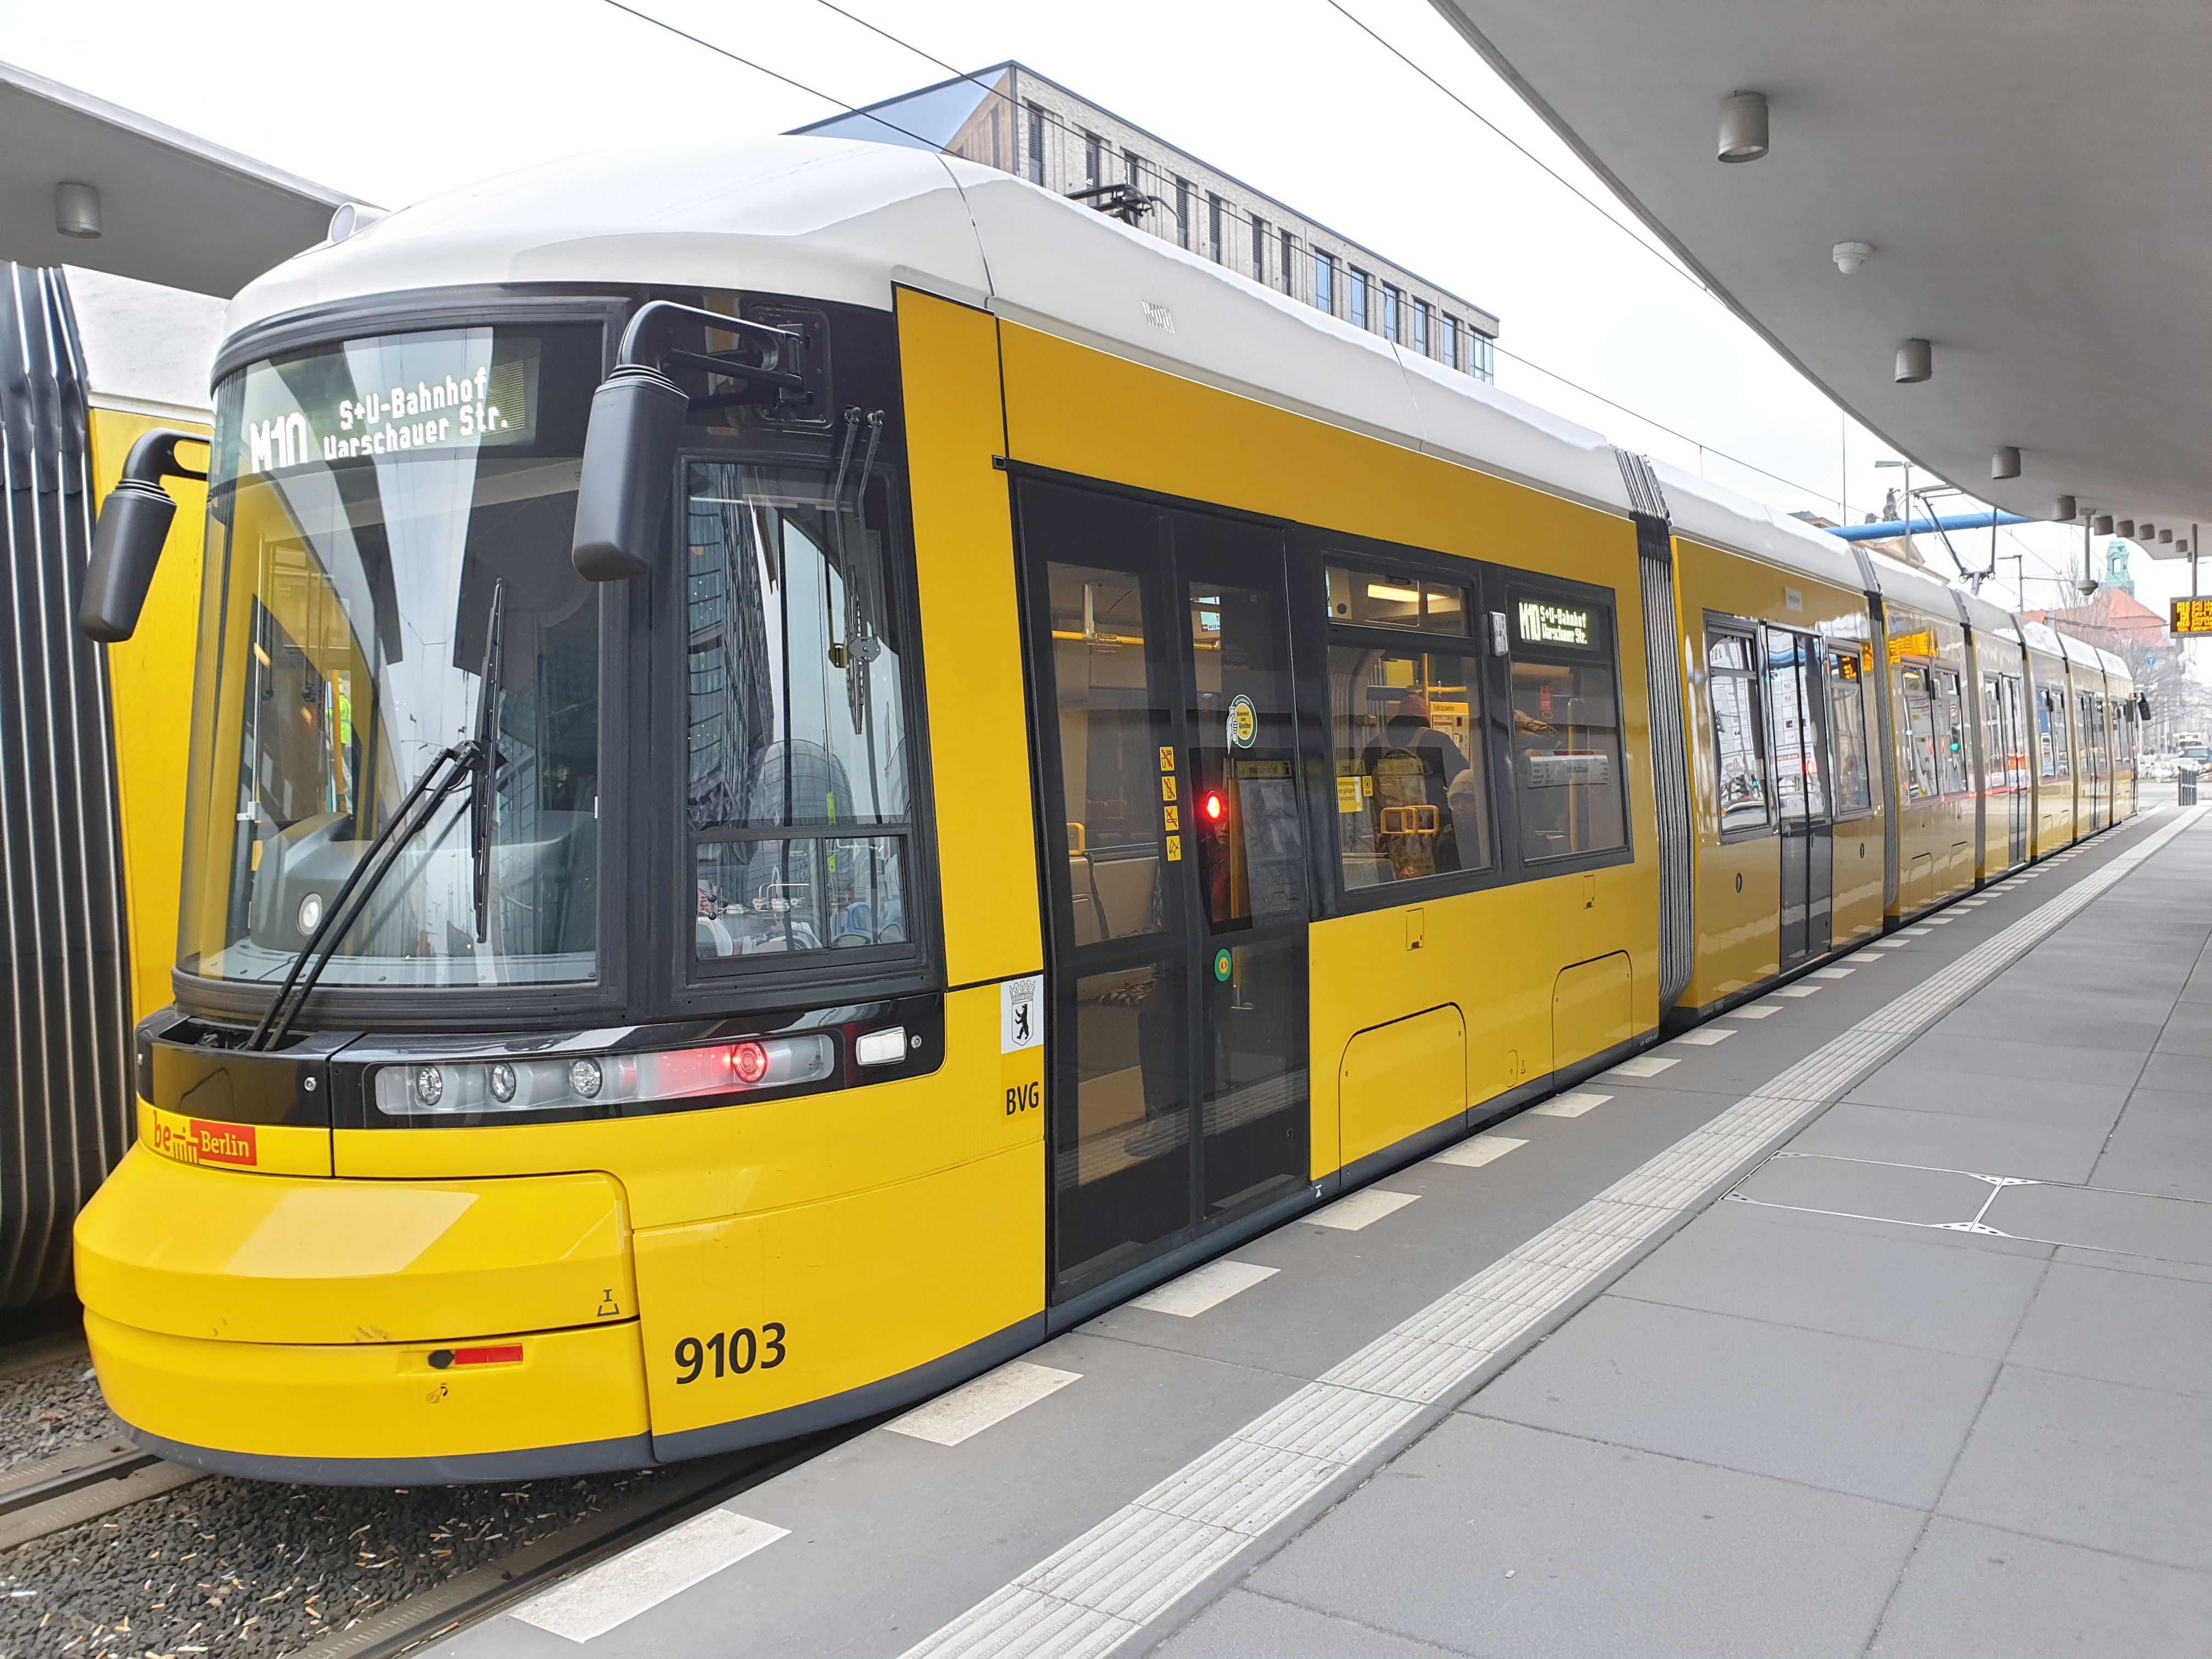 Foto: Straßenbahn 9103, Typ Flexity ZRL, Berlin Hbf, Januar 2019